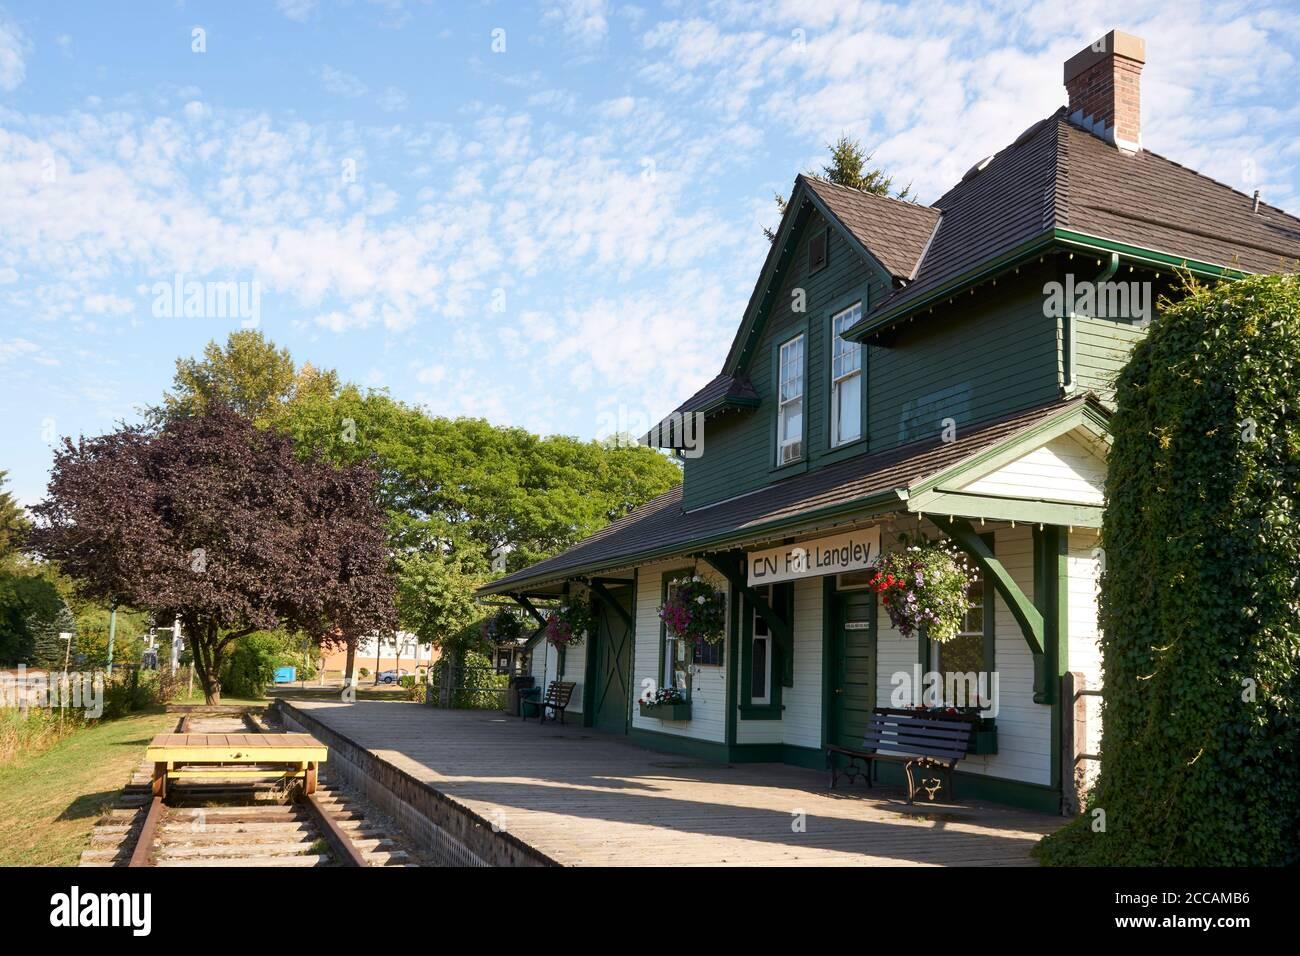 Heritage CNR Canadian National Railway Station in der Stadt Fort Langley, British Columbia, Kanada Stockfoto